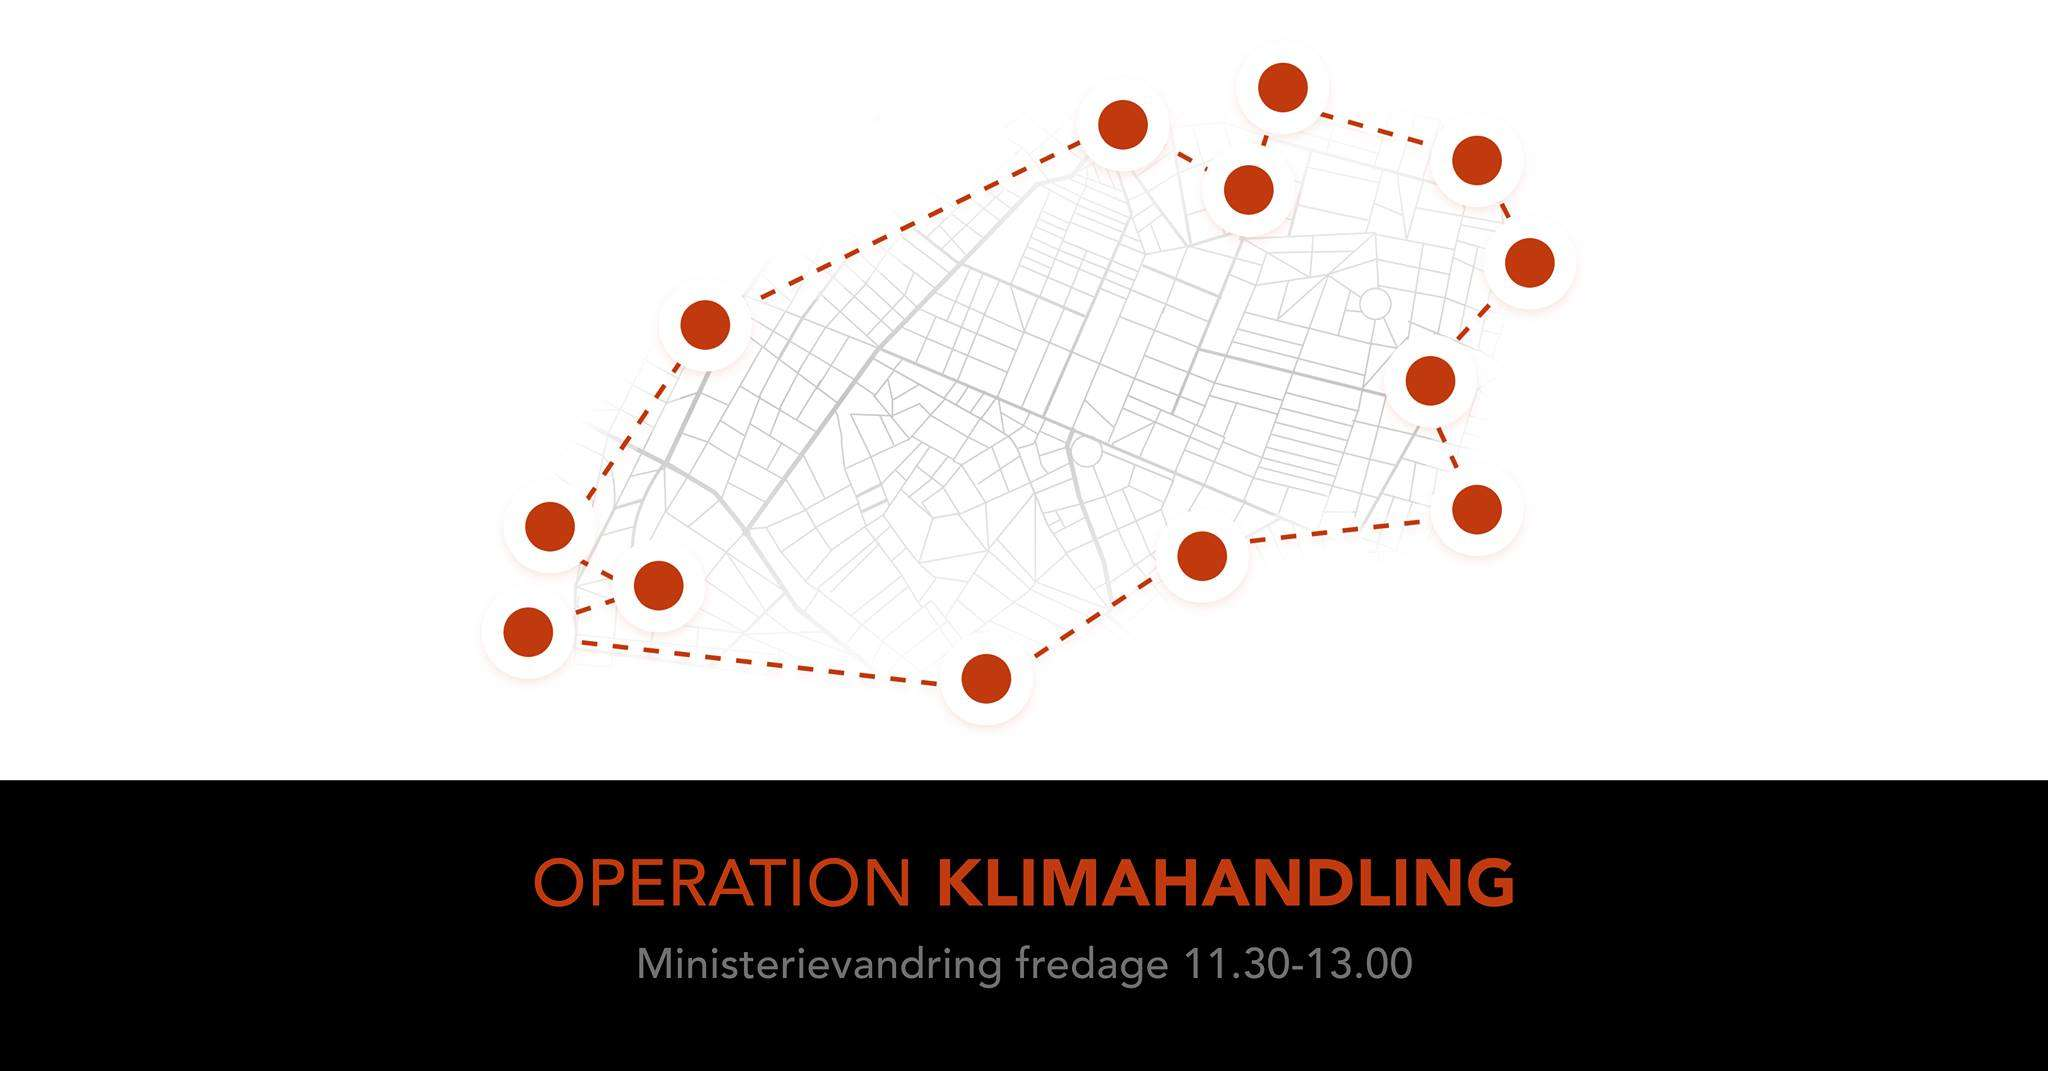 Operation Klimahandling